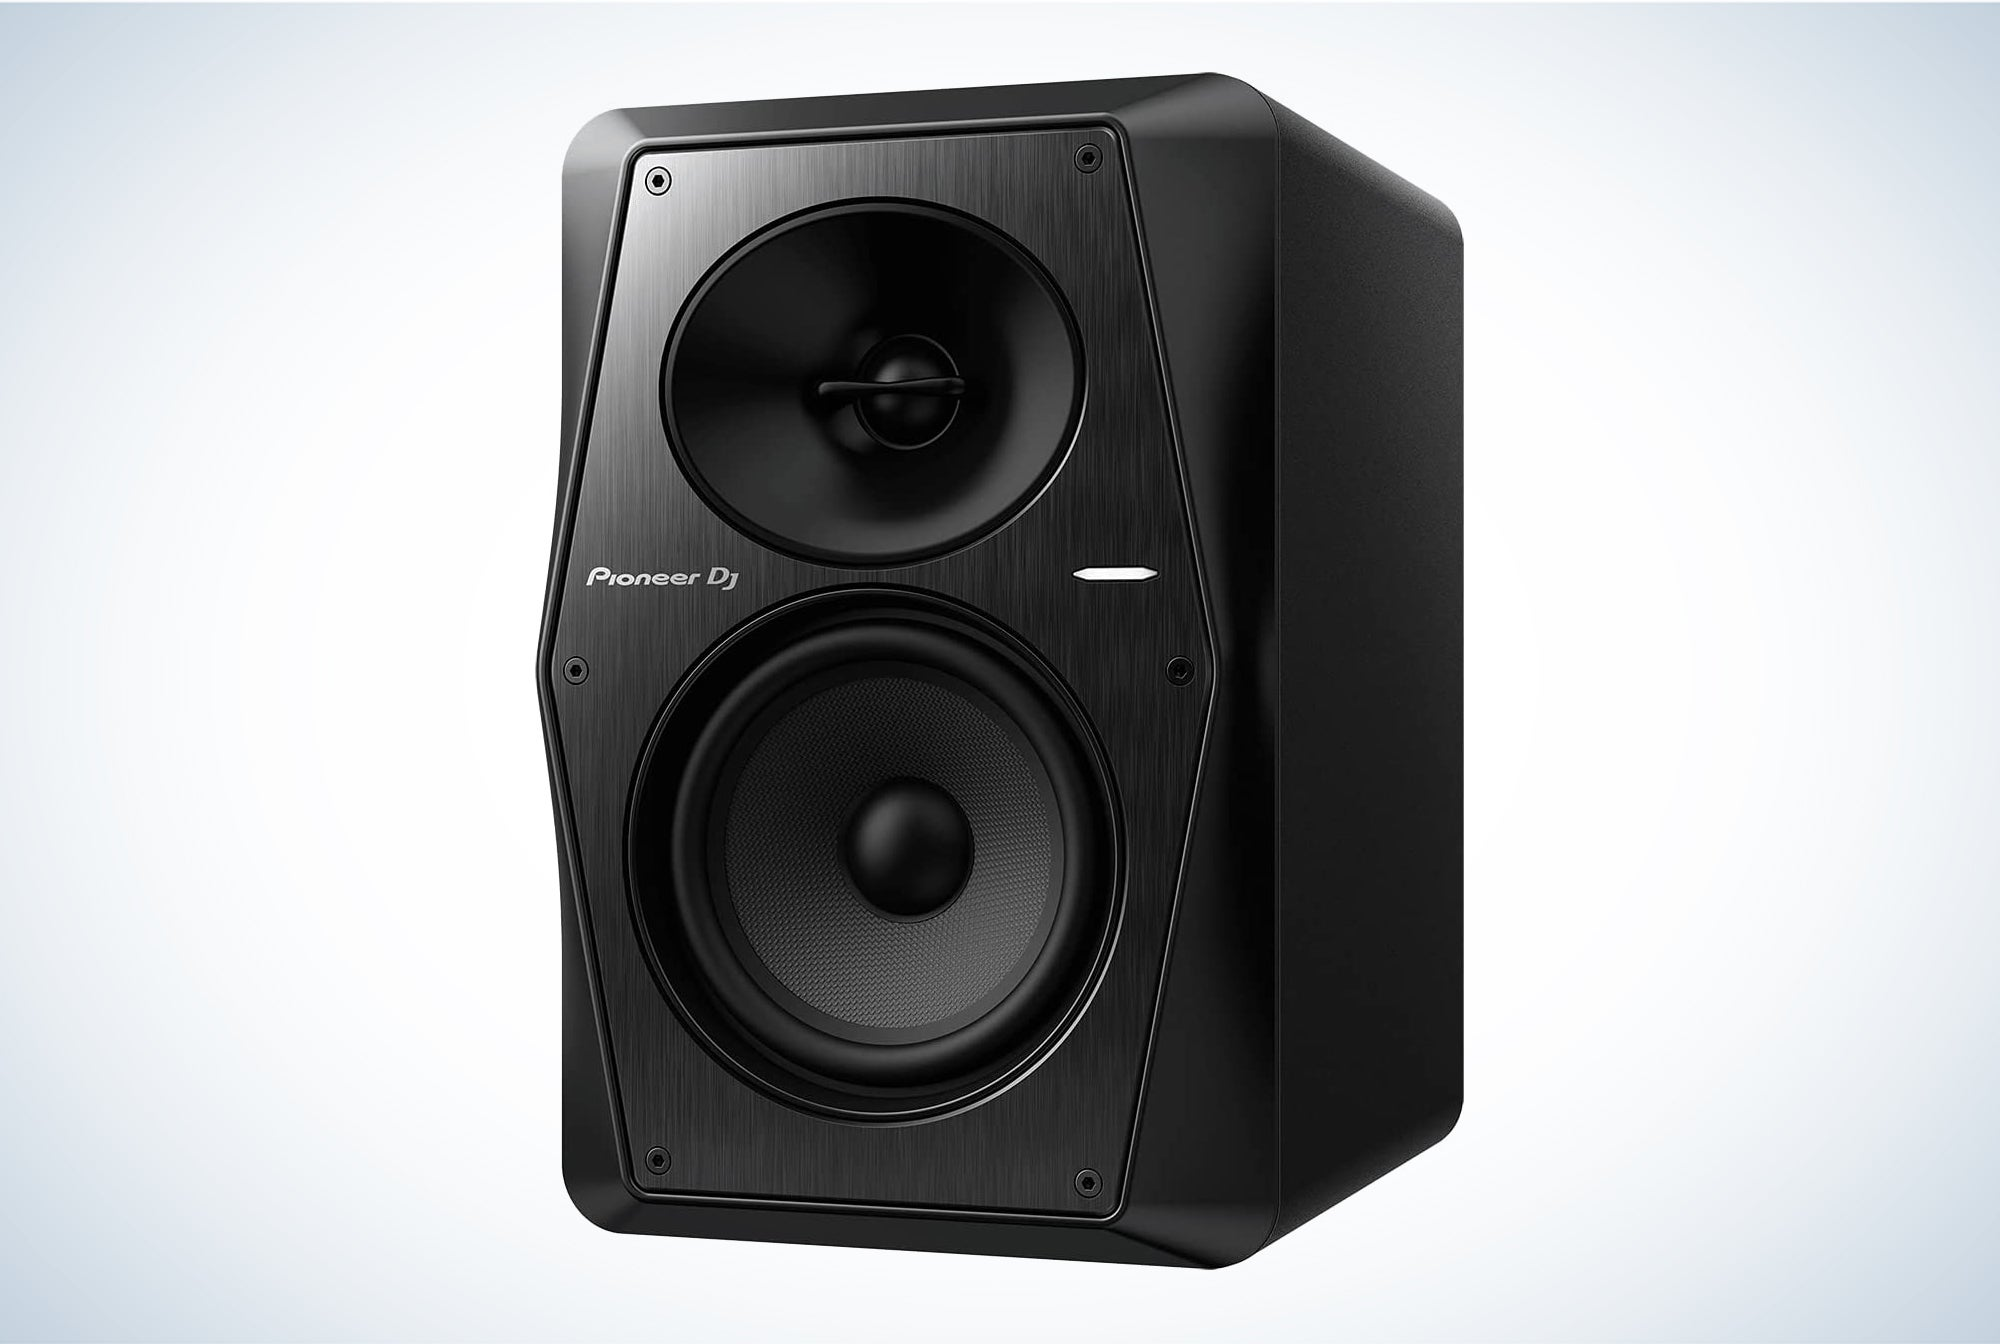 Pioneer VM-50 studio monitor product card